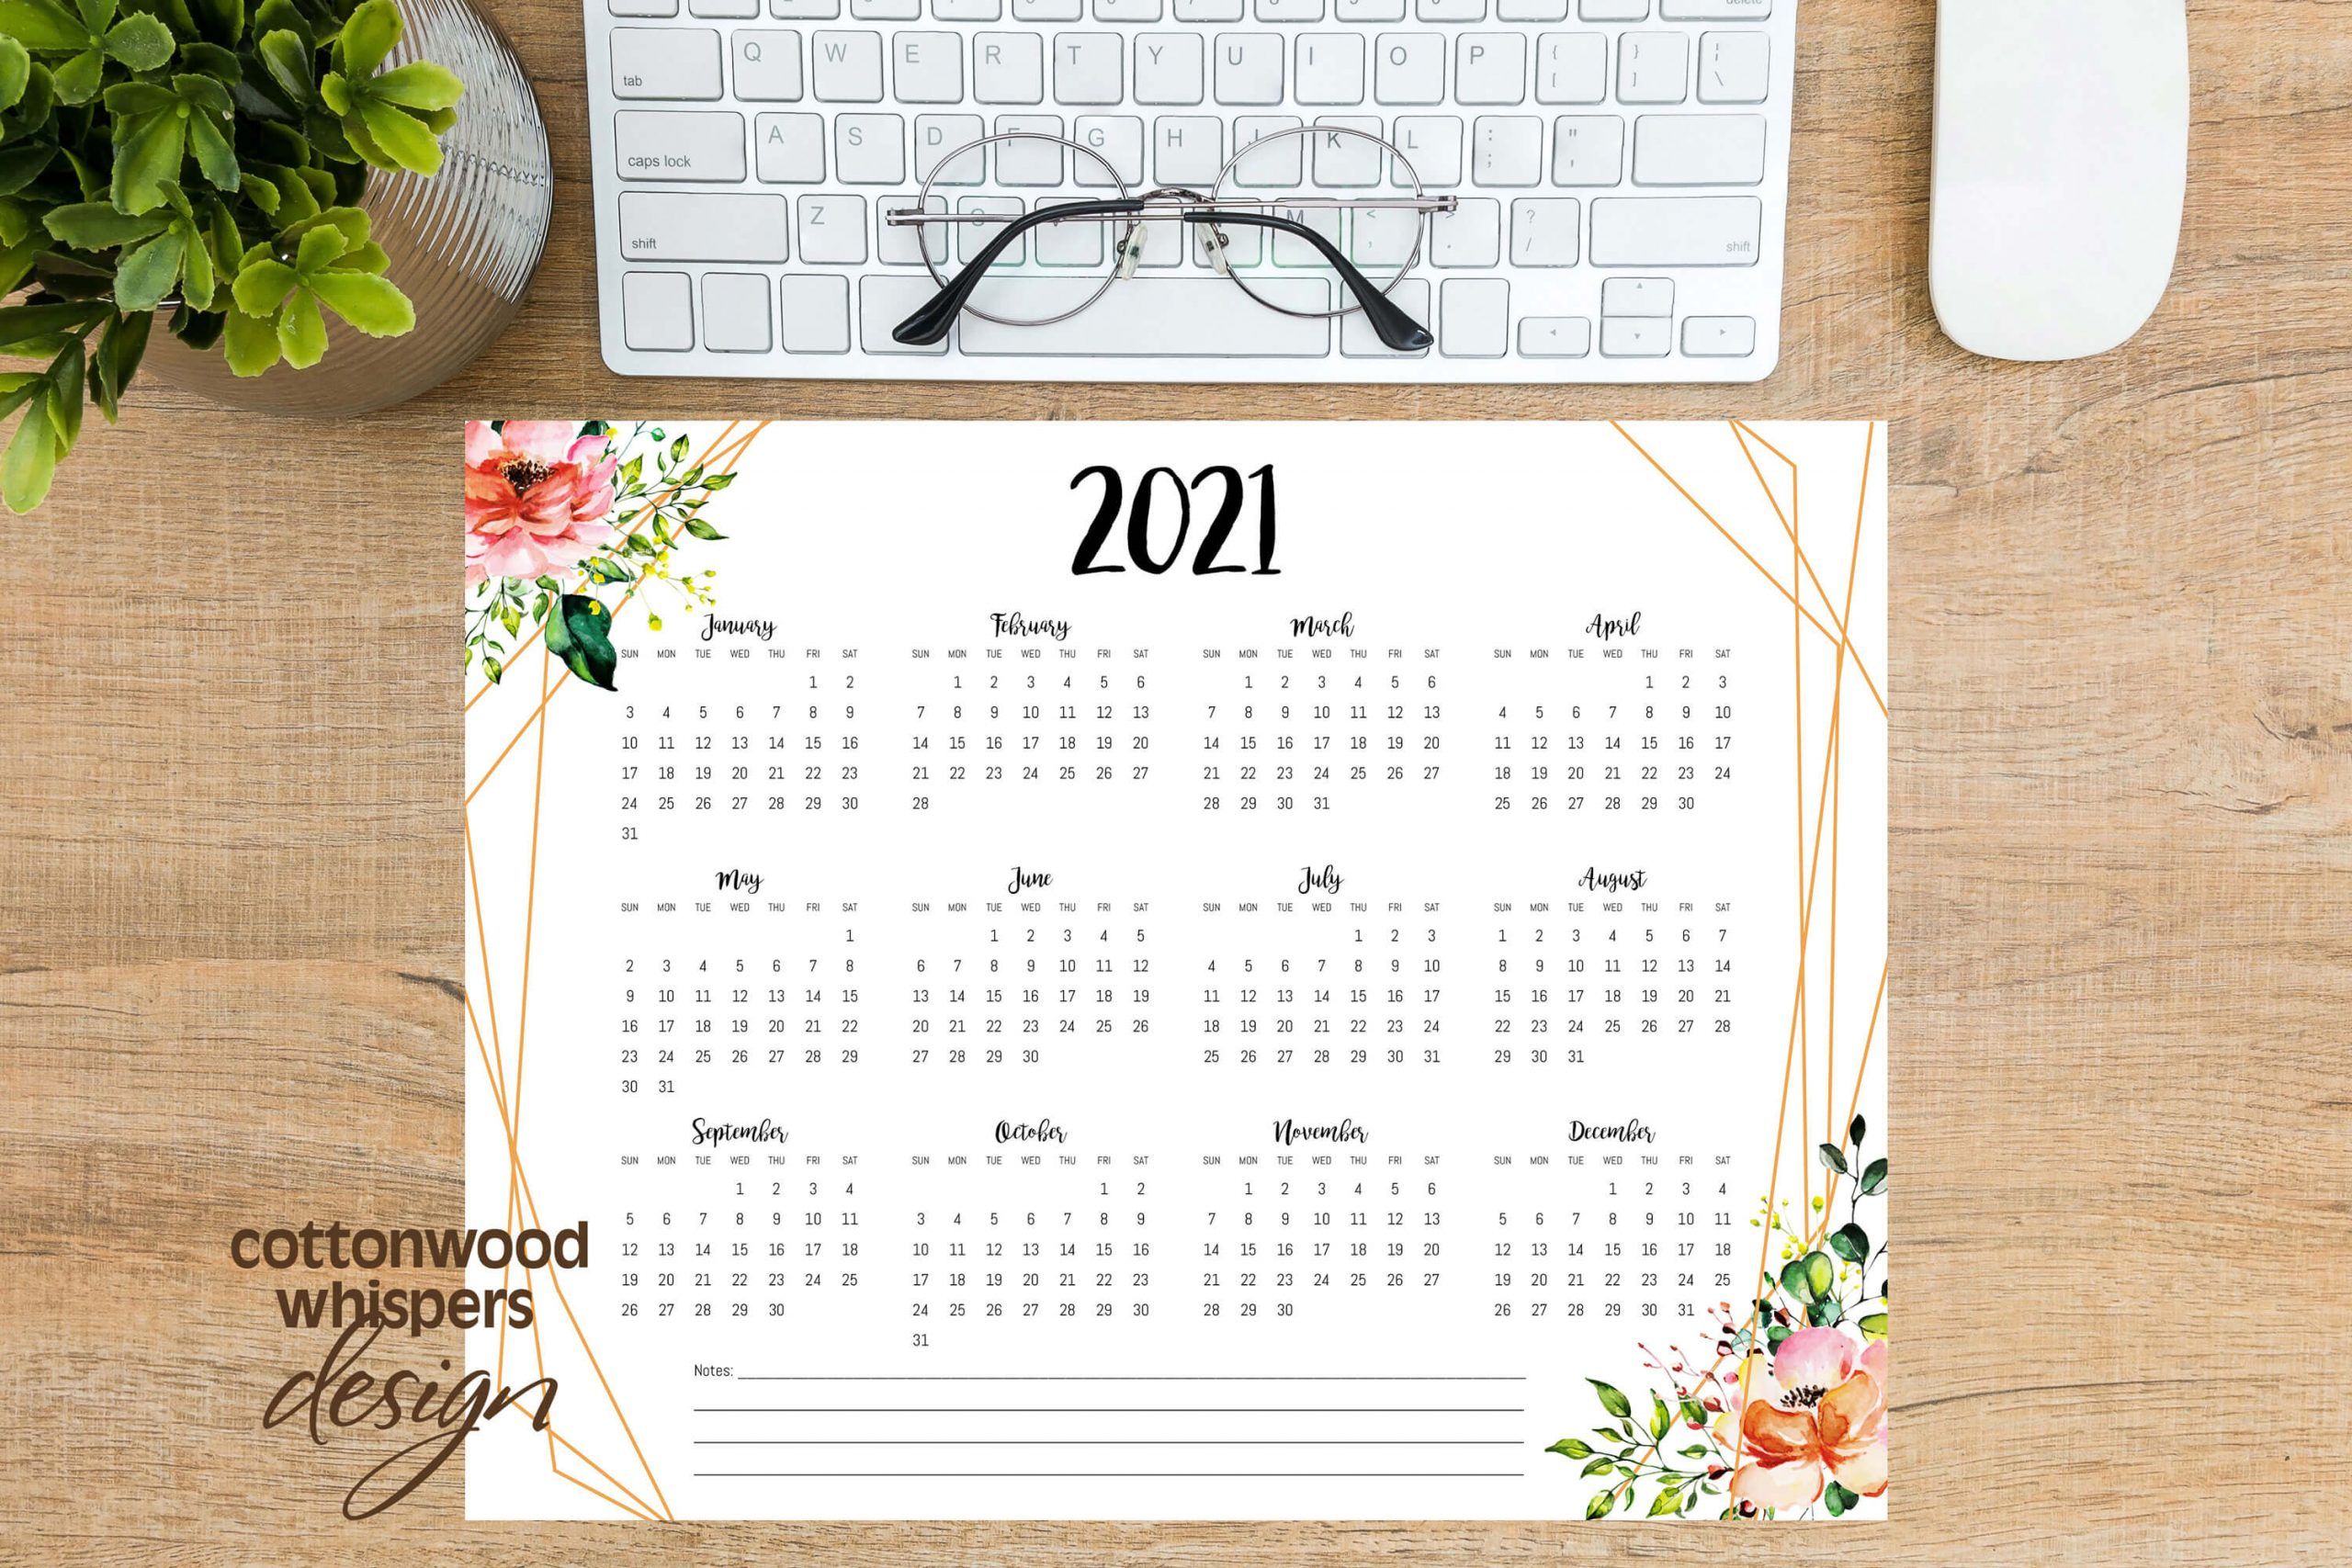 2021 Year At A Glance Calendar | Geometric Floral